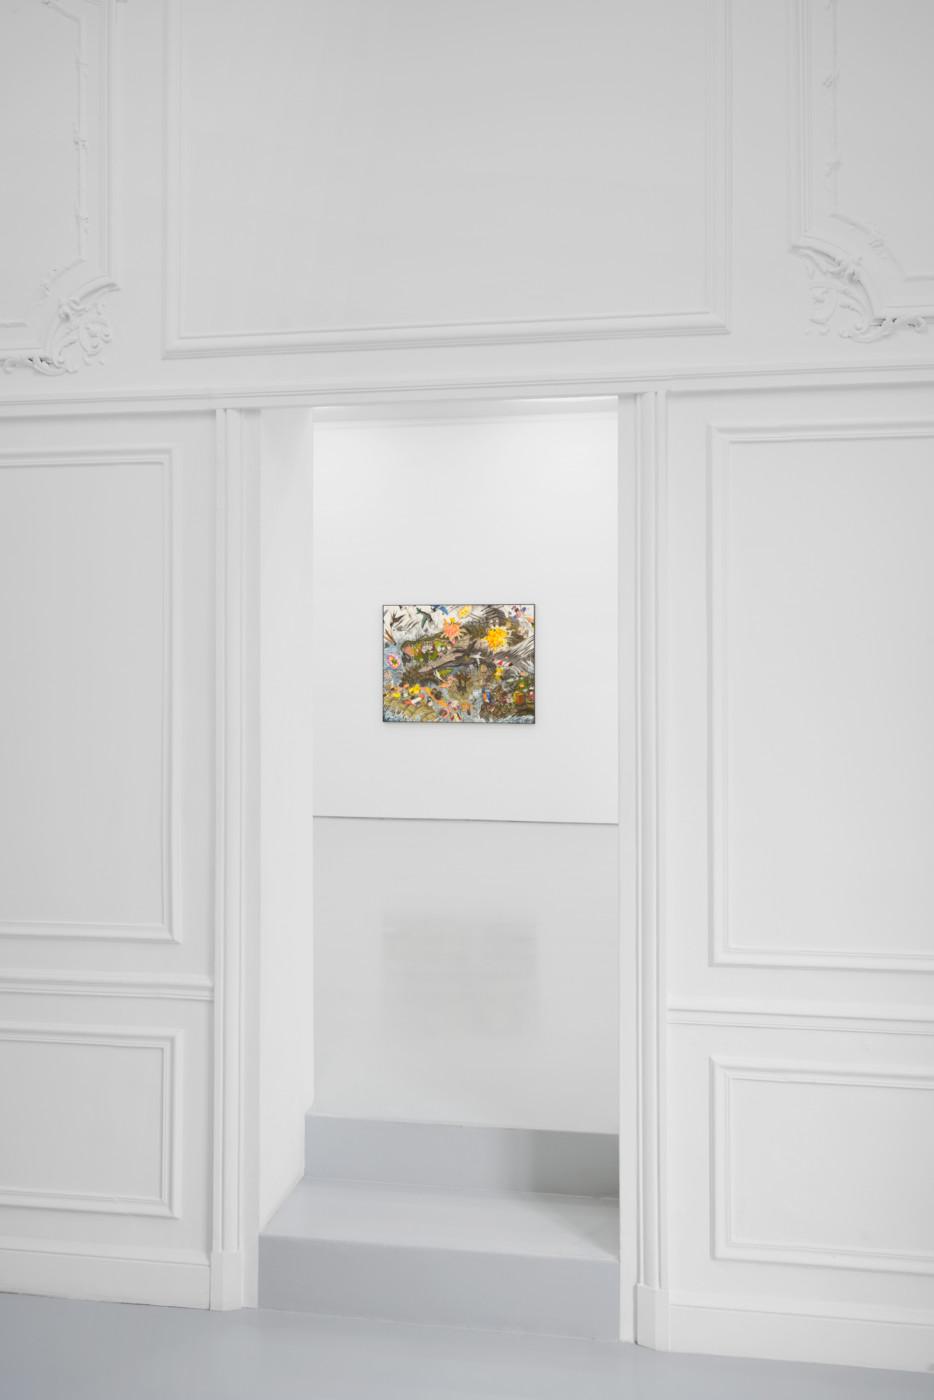 HUN KYU KIM  PURE WAR , 2019, High Art, Paris, installation view - High Art Gallery Paris